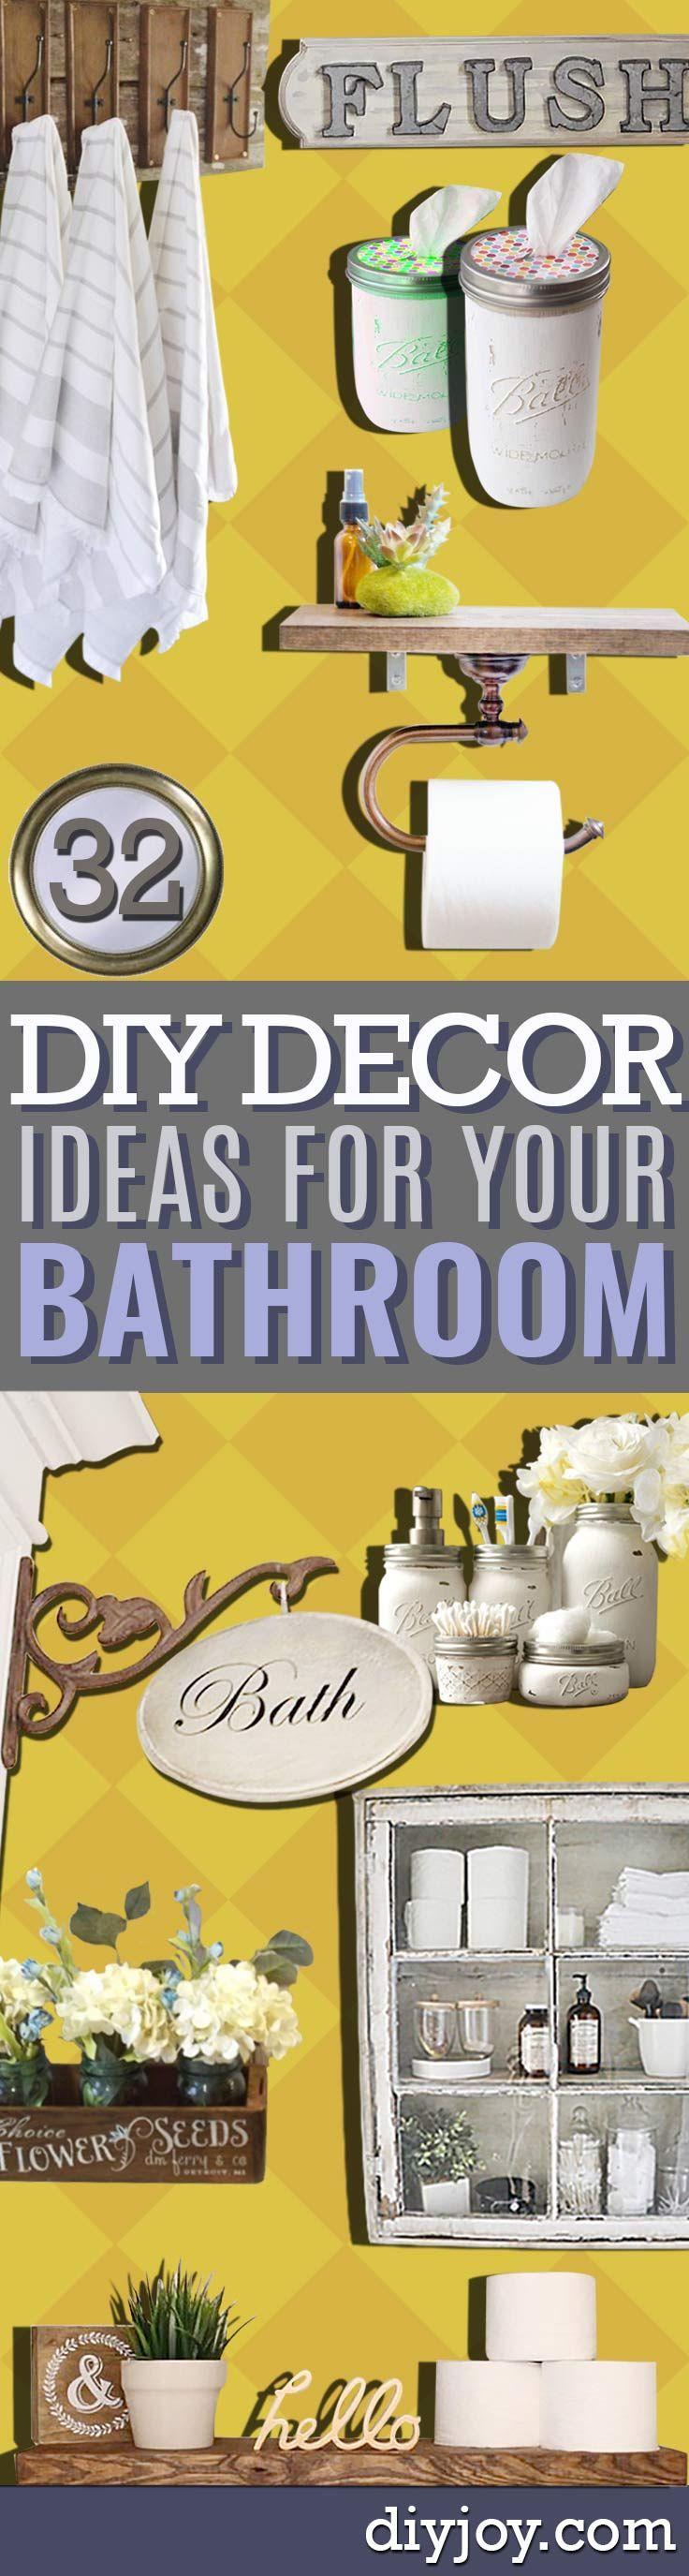 DIY Bathroom Decor Ideas -  Cool Do It Yourself Bath Ideas on A Budget, Rustic Bathroom Fixtures, Creative Wall Art, Rugs, Mason Jar Accessories and Easy Projects http://diyjoy.com/diy-bathroom-decor-ideas